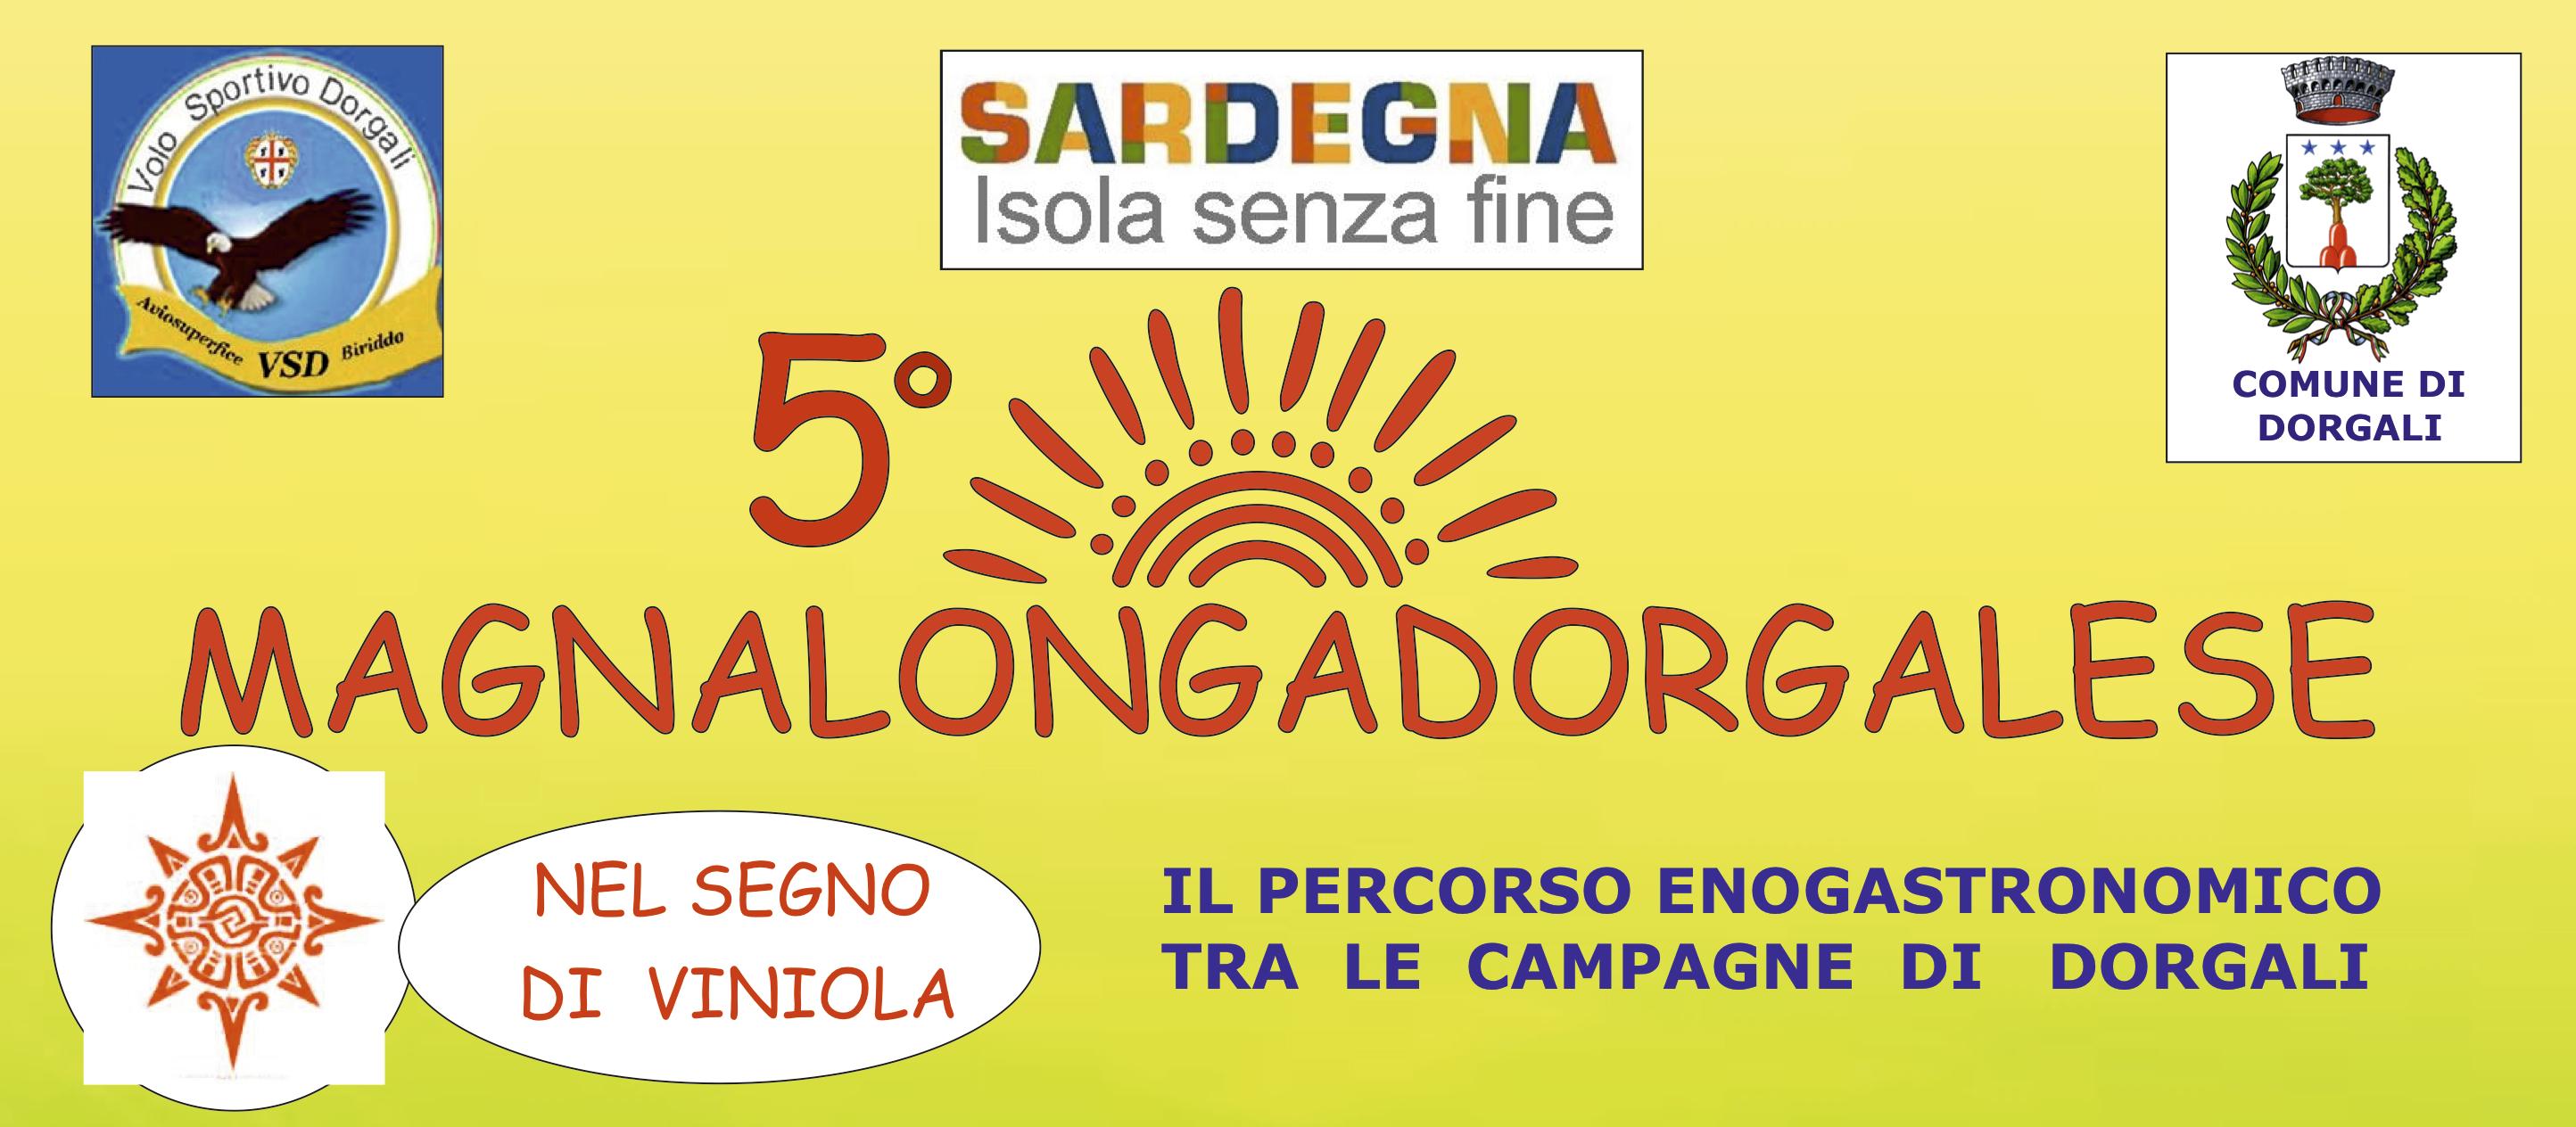 MAGNALONGA DORGALESE 2017